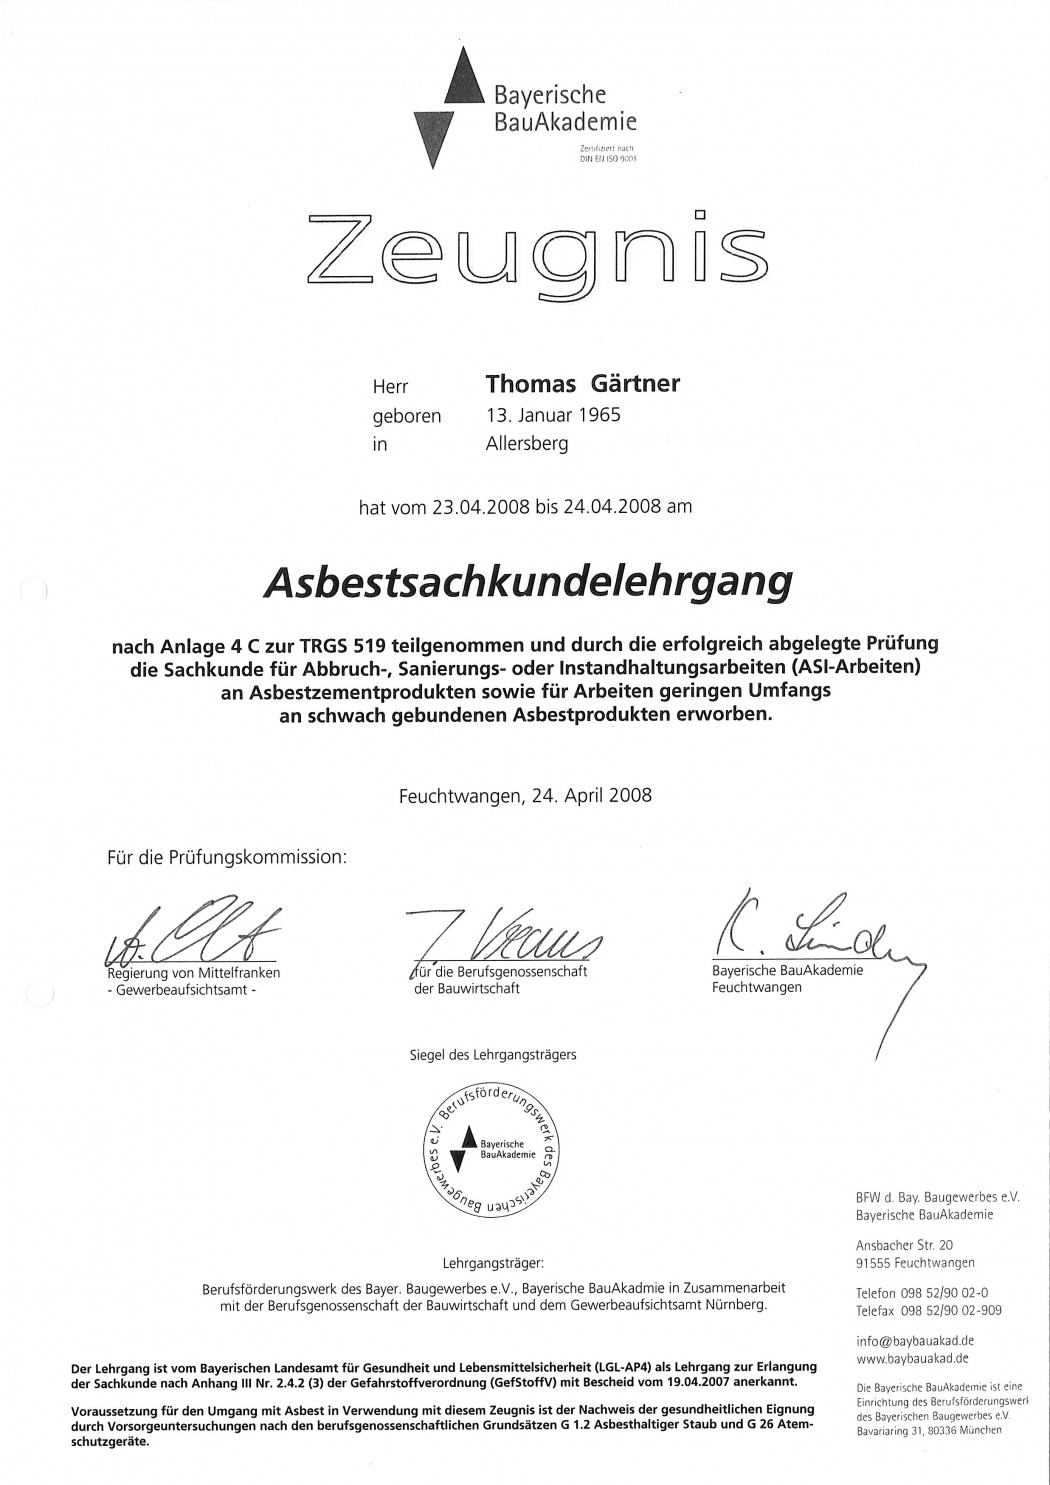 Asbestsachkundelehrgang_2008_04_24